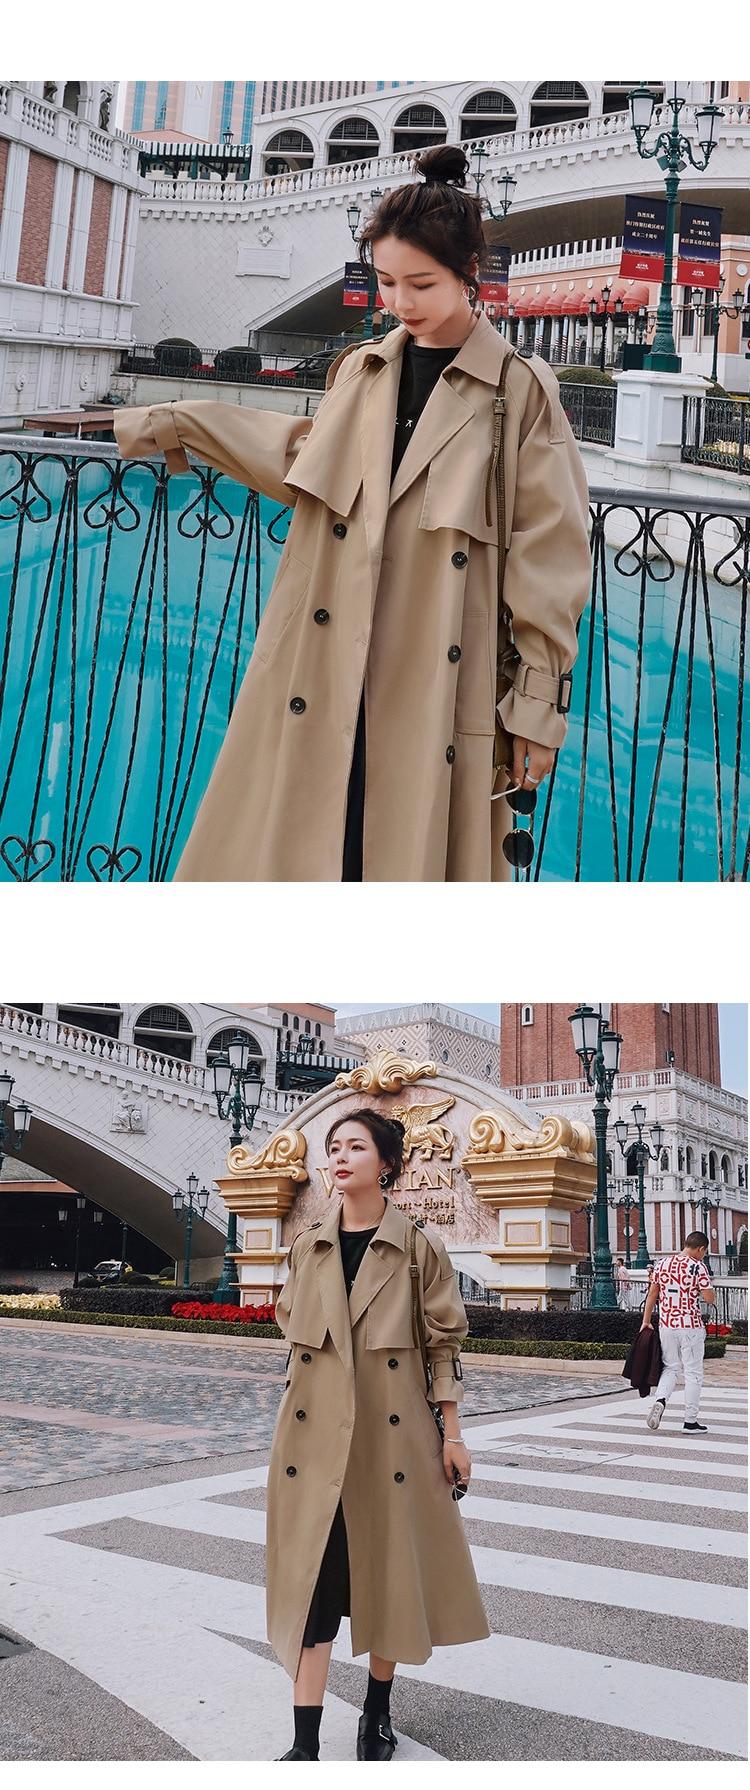 H68d7949c63414673b00554d31c3cbe1f1 2021 Autumn Women Trench Coat With Belt Women Clothes Blue Coat Casaco Feminino Harajuku Abrigo Mujer Long Trench Femme